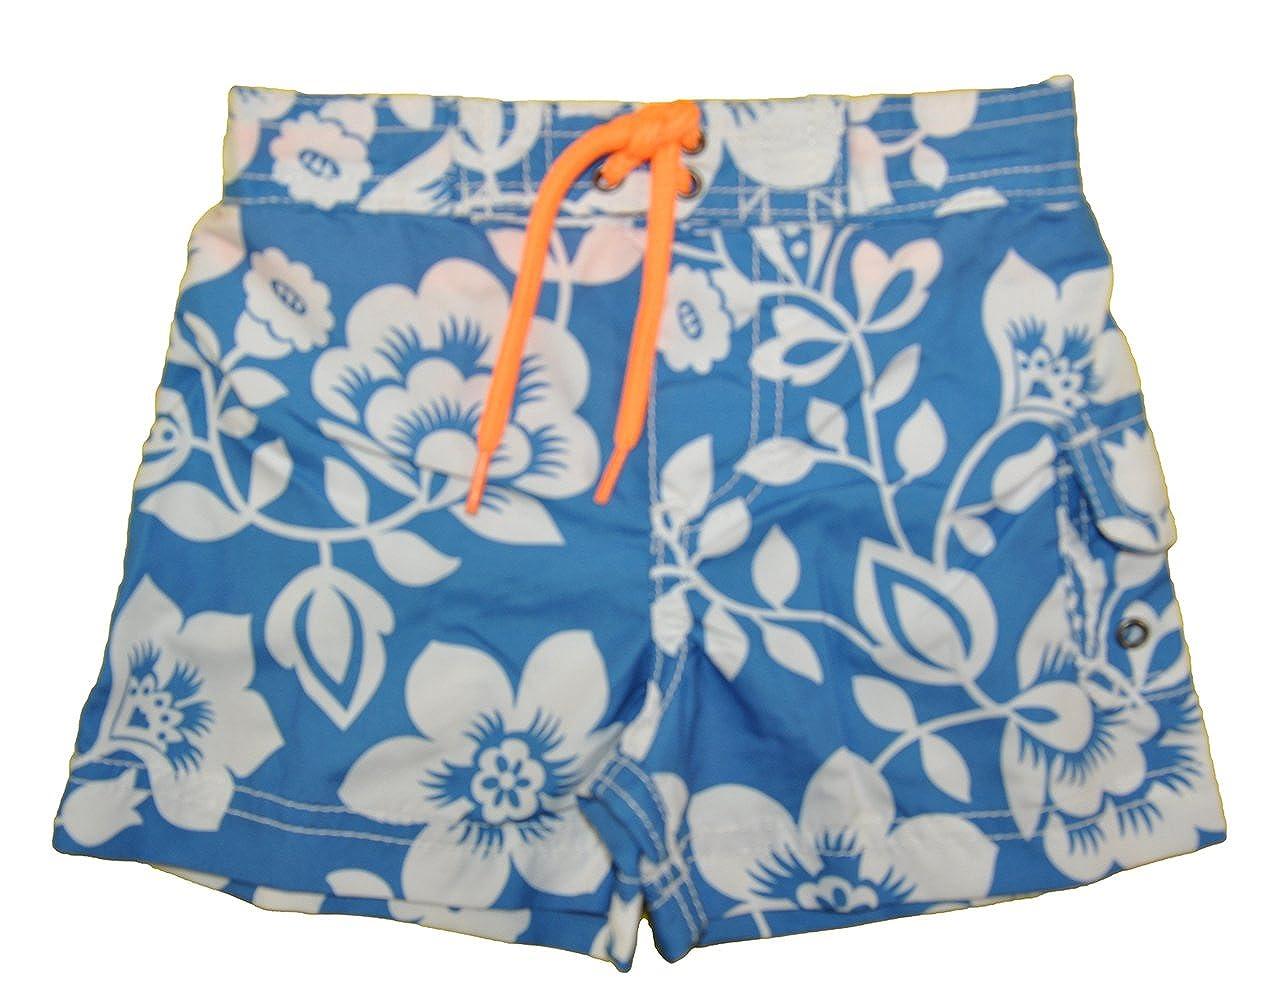 Carter's. Baby Boys' Blue Tropical Print Swim Short Carter' s.